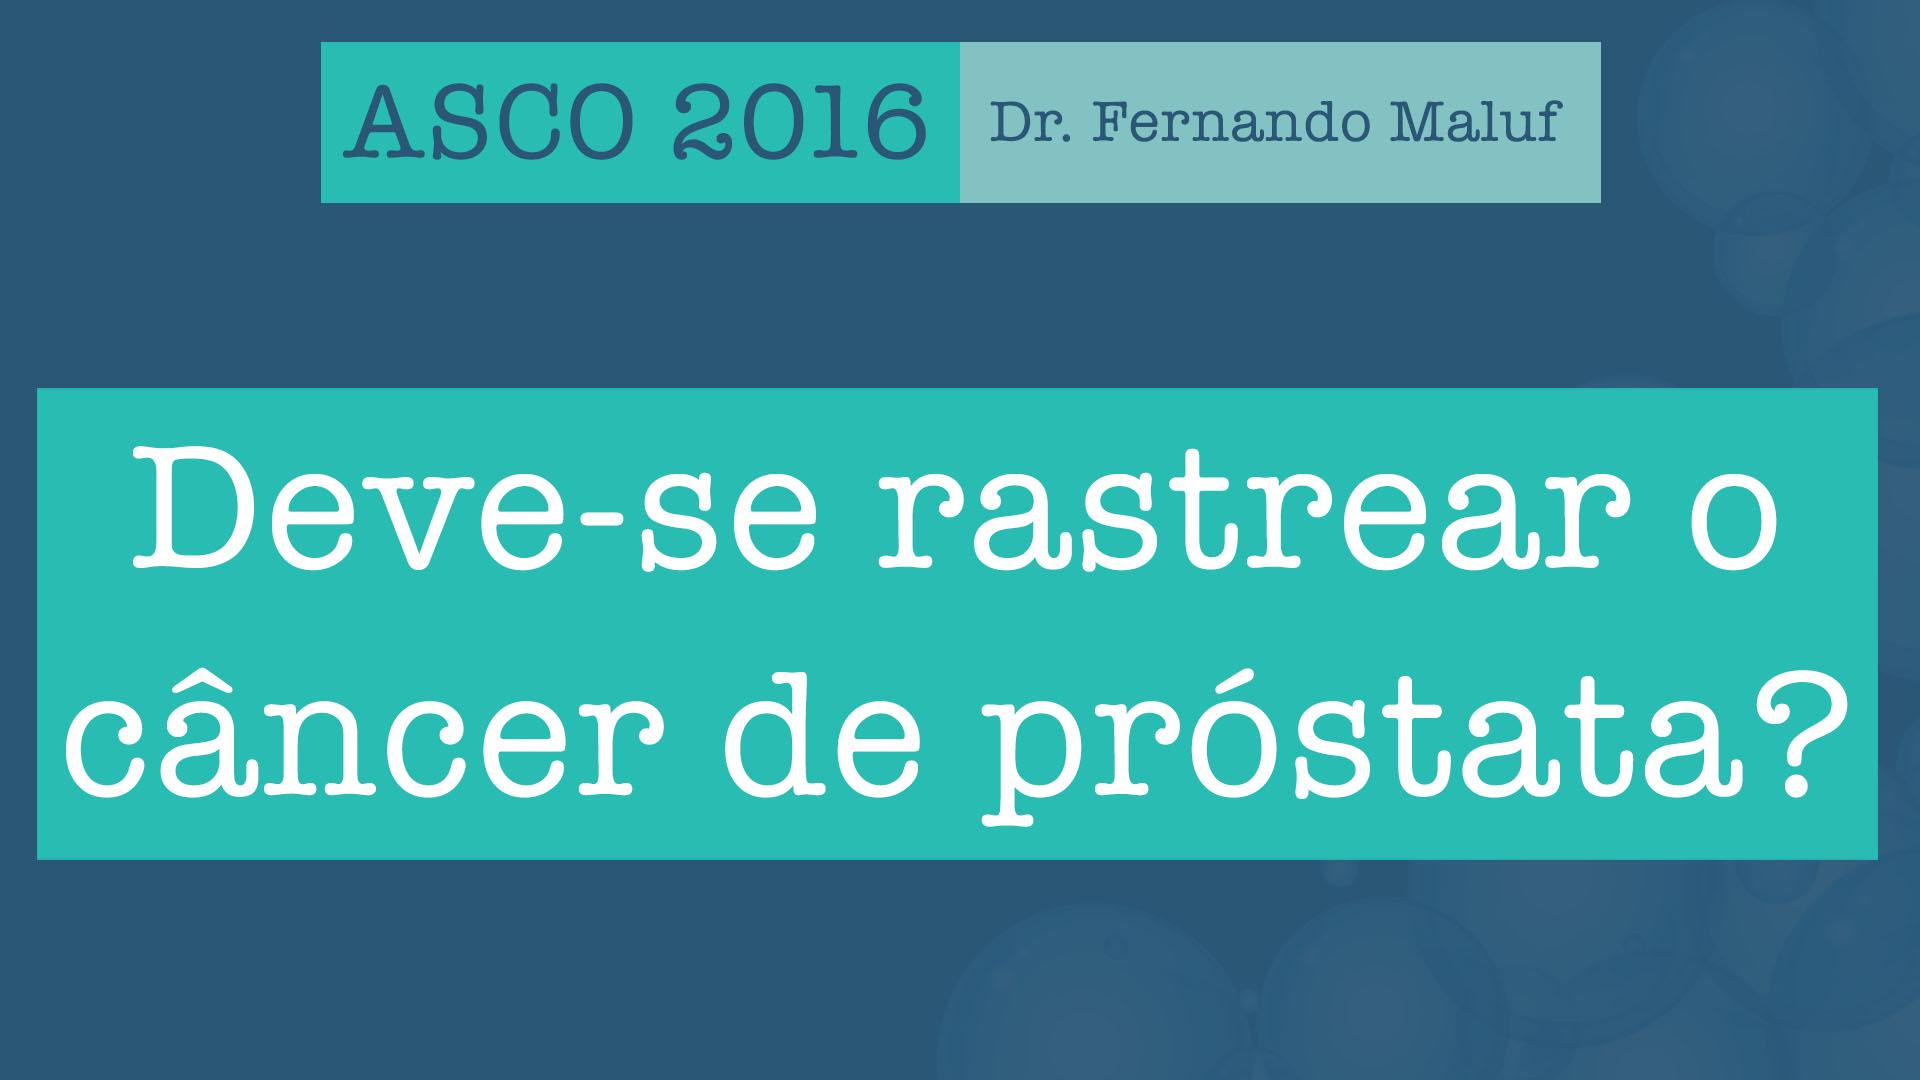 cancer de prostata imunoterapia